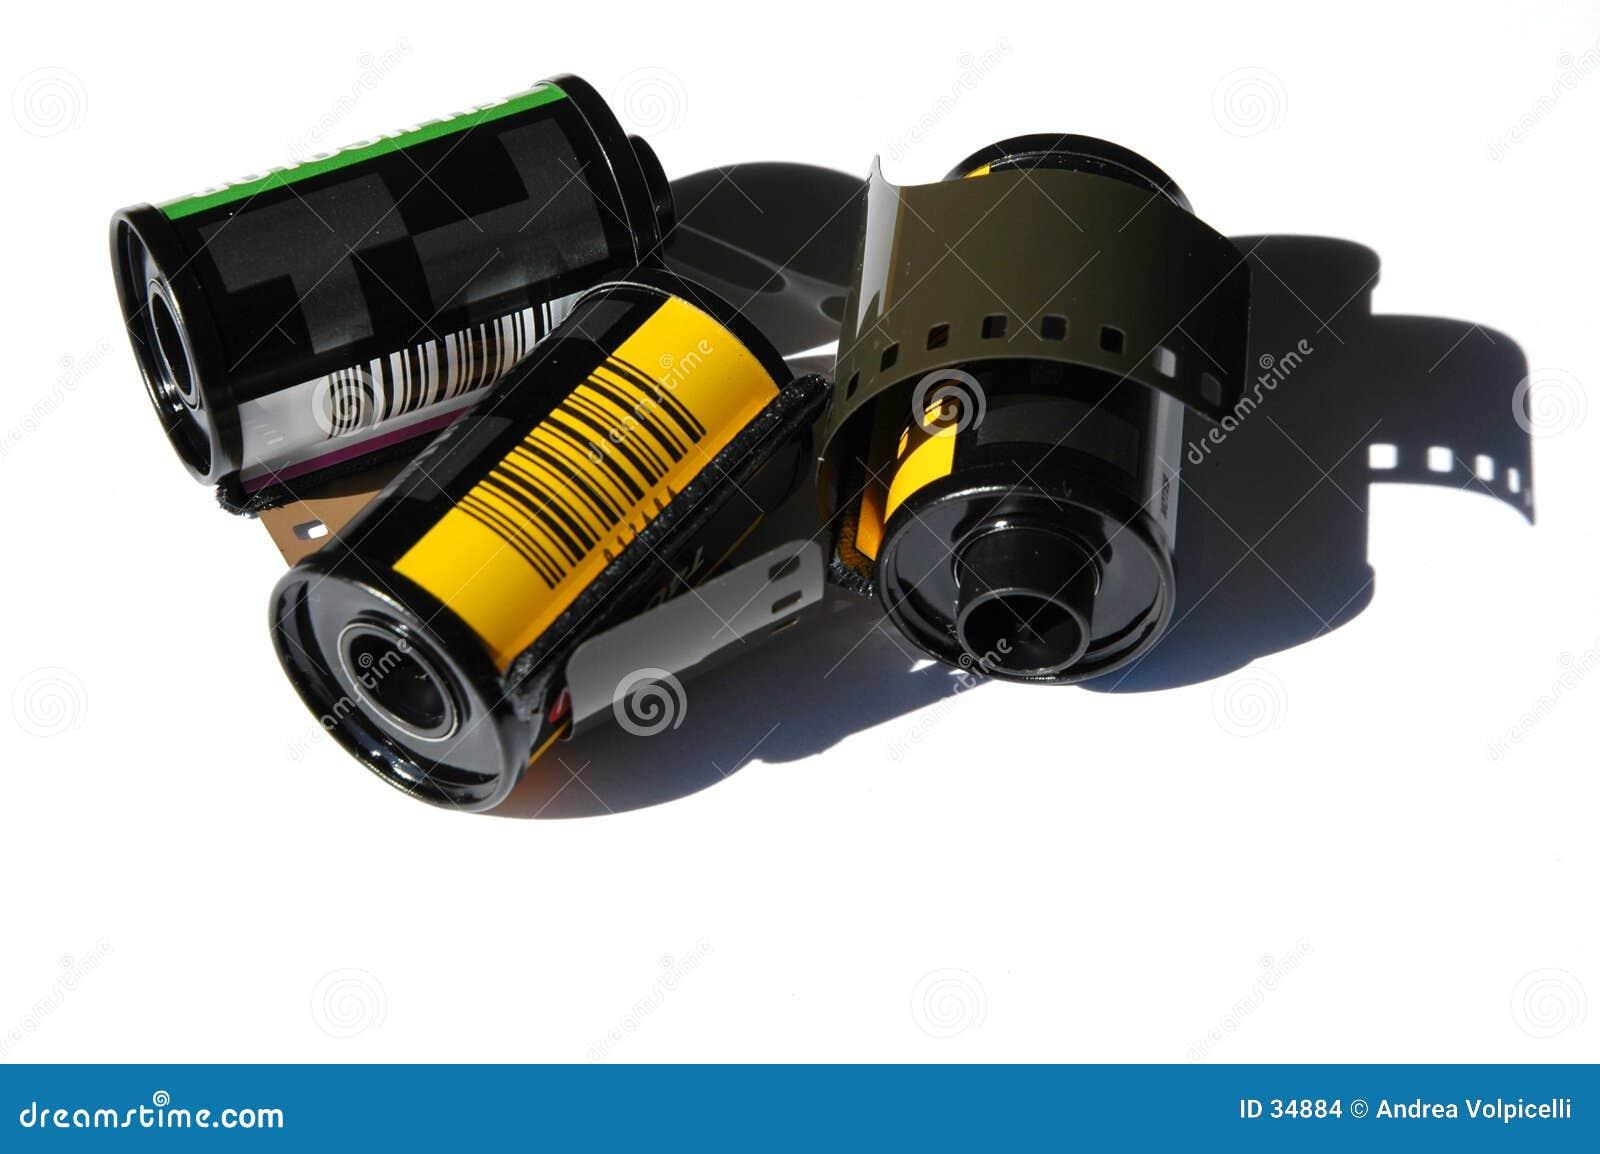 35mm filmer